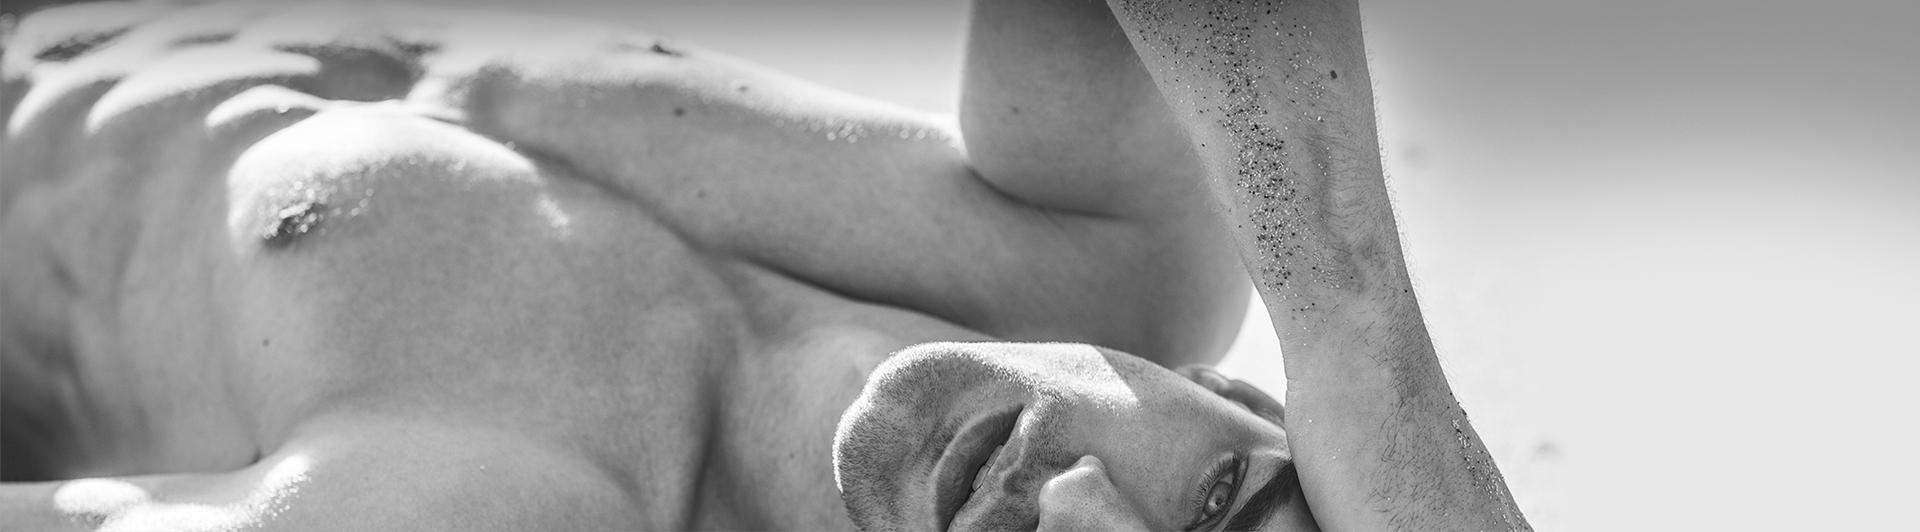 Plastic Surgery for Men in Tarzana